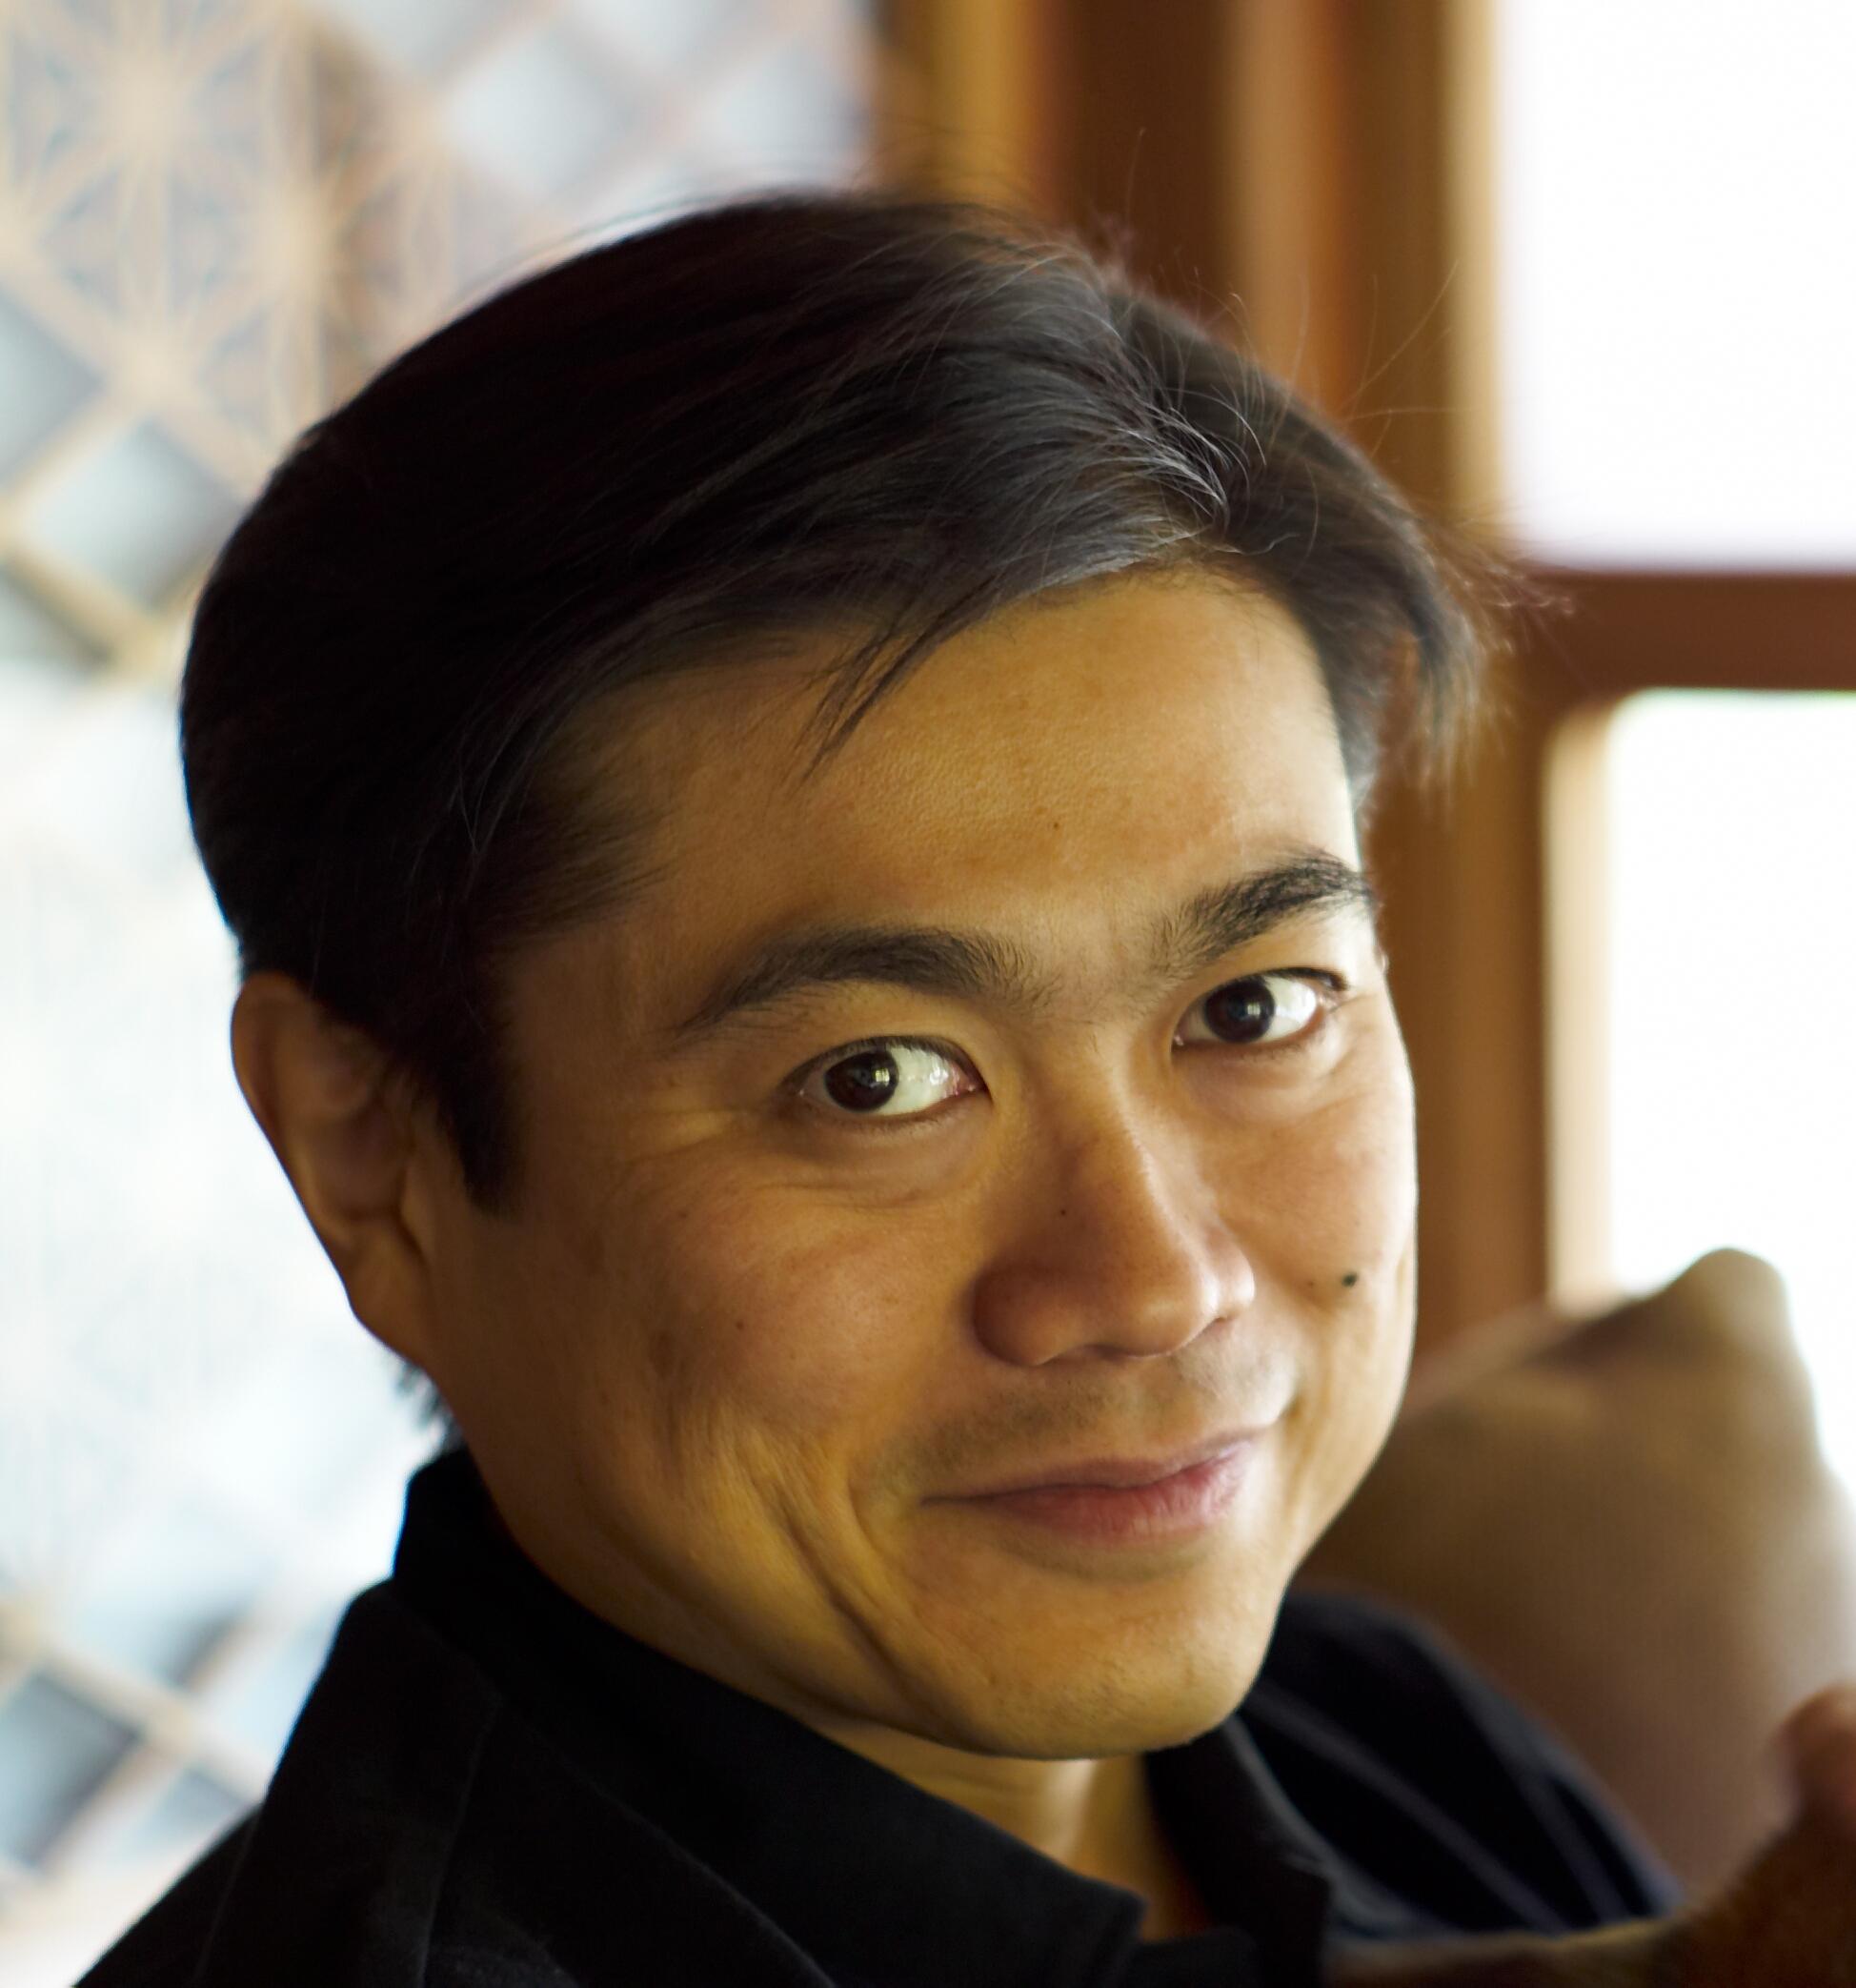 Joichi_Ito_Headshot_2007.jpg